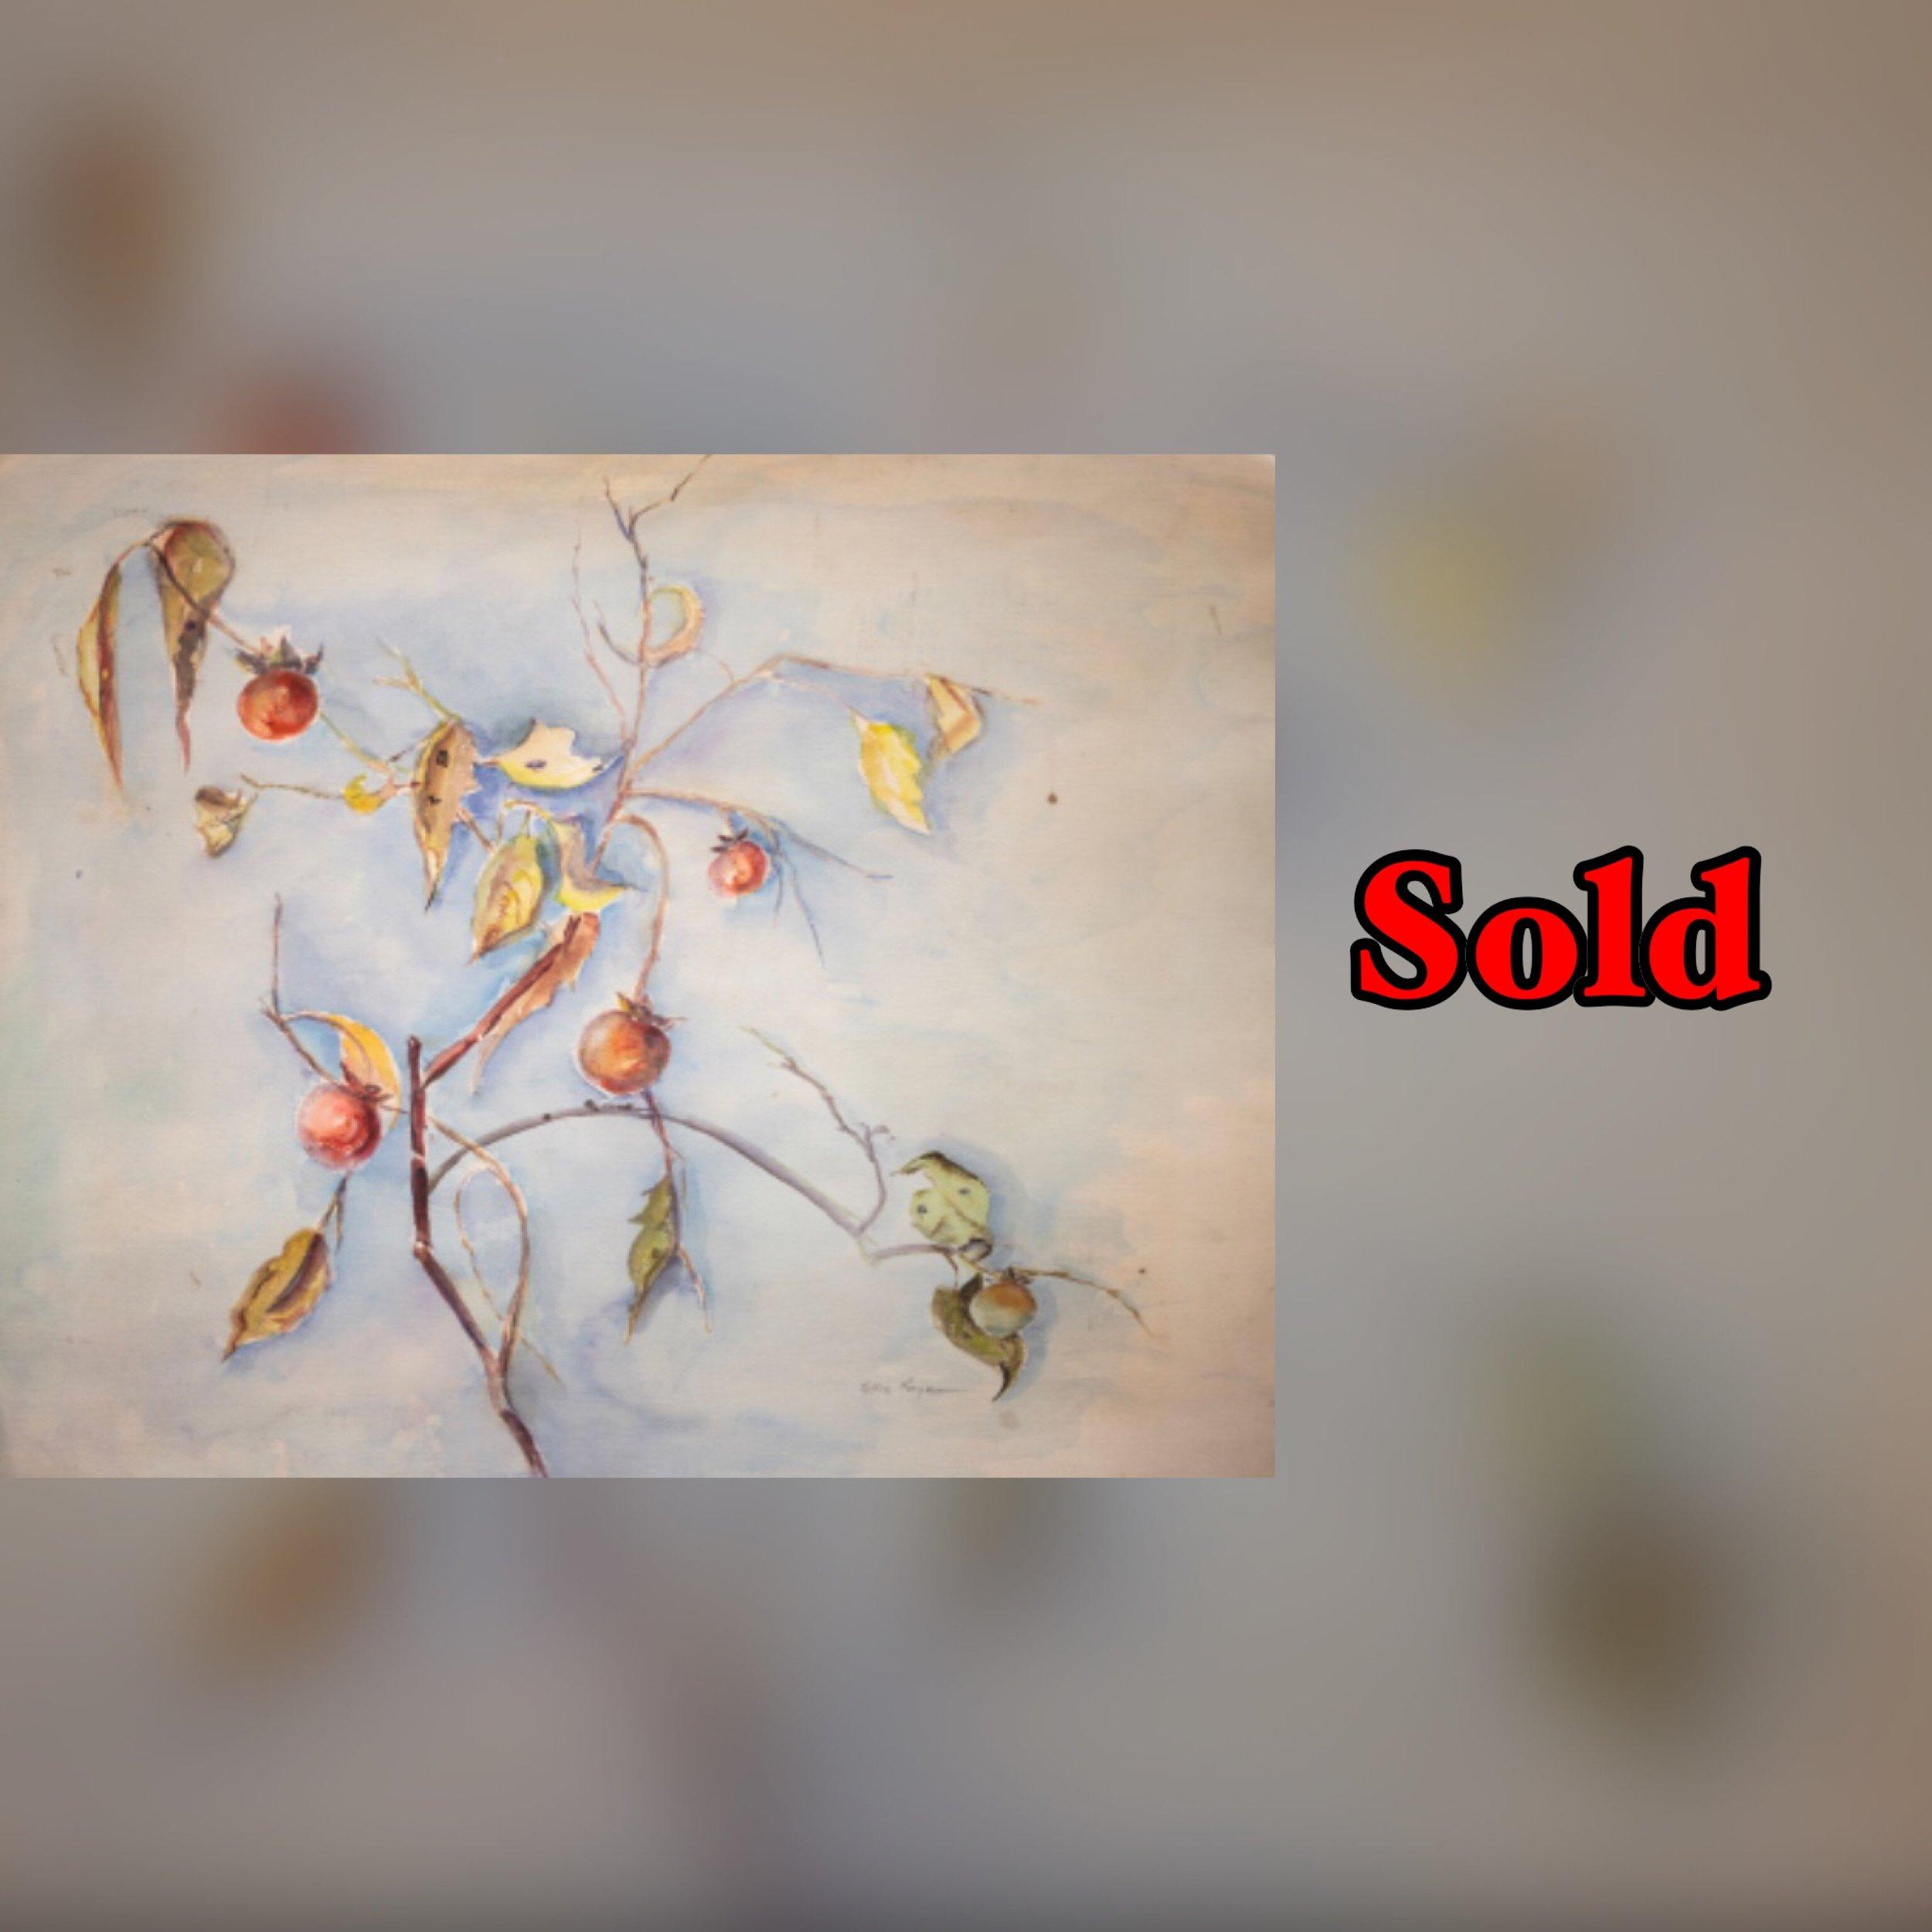 crabapple sold.jpg